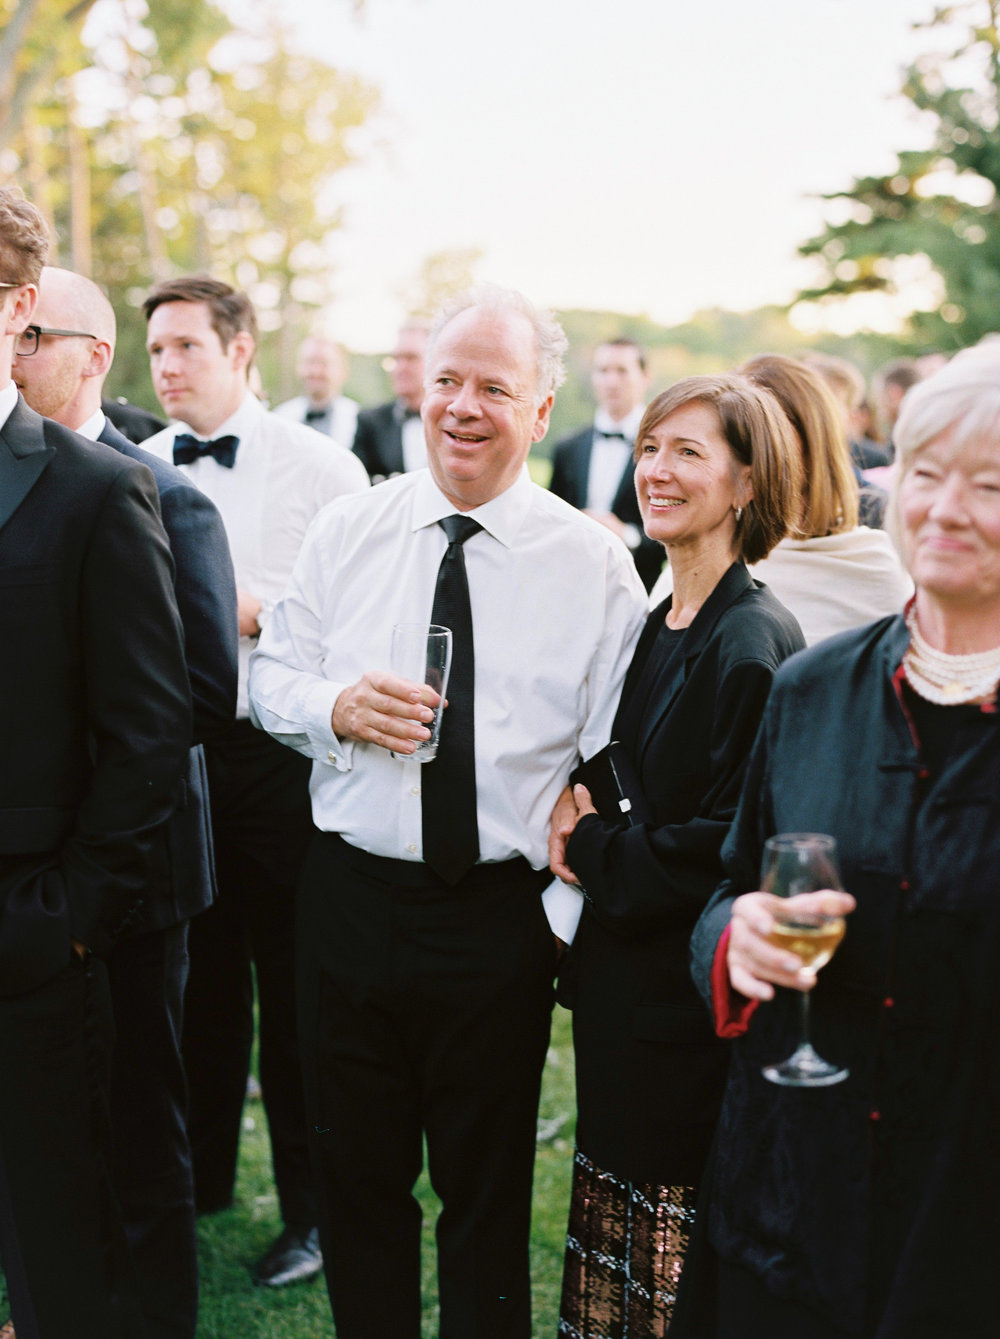 0690-Geneva-Ian-Wedding-Toronto Golf Club-When He Found Her-TorontoPhotographer.jpg